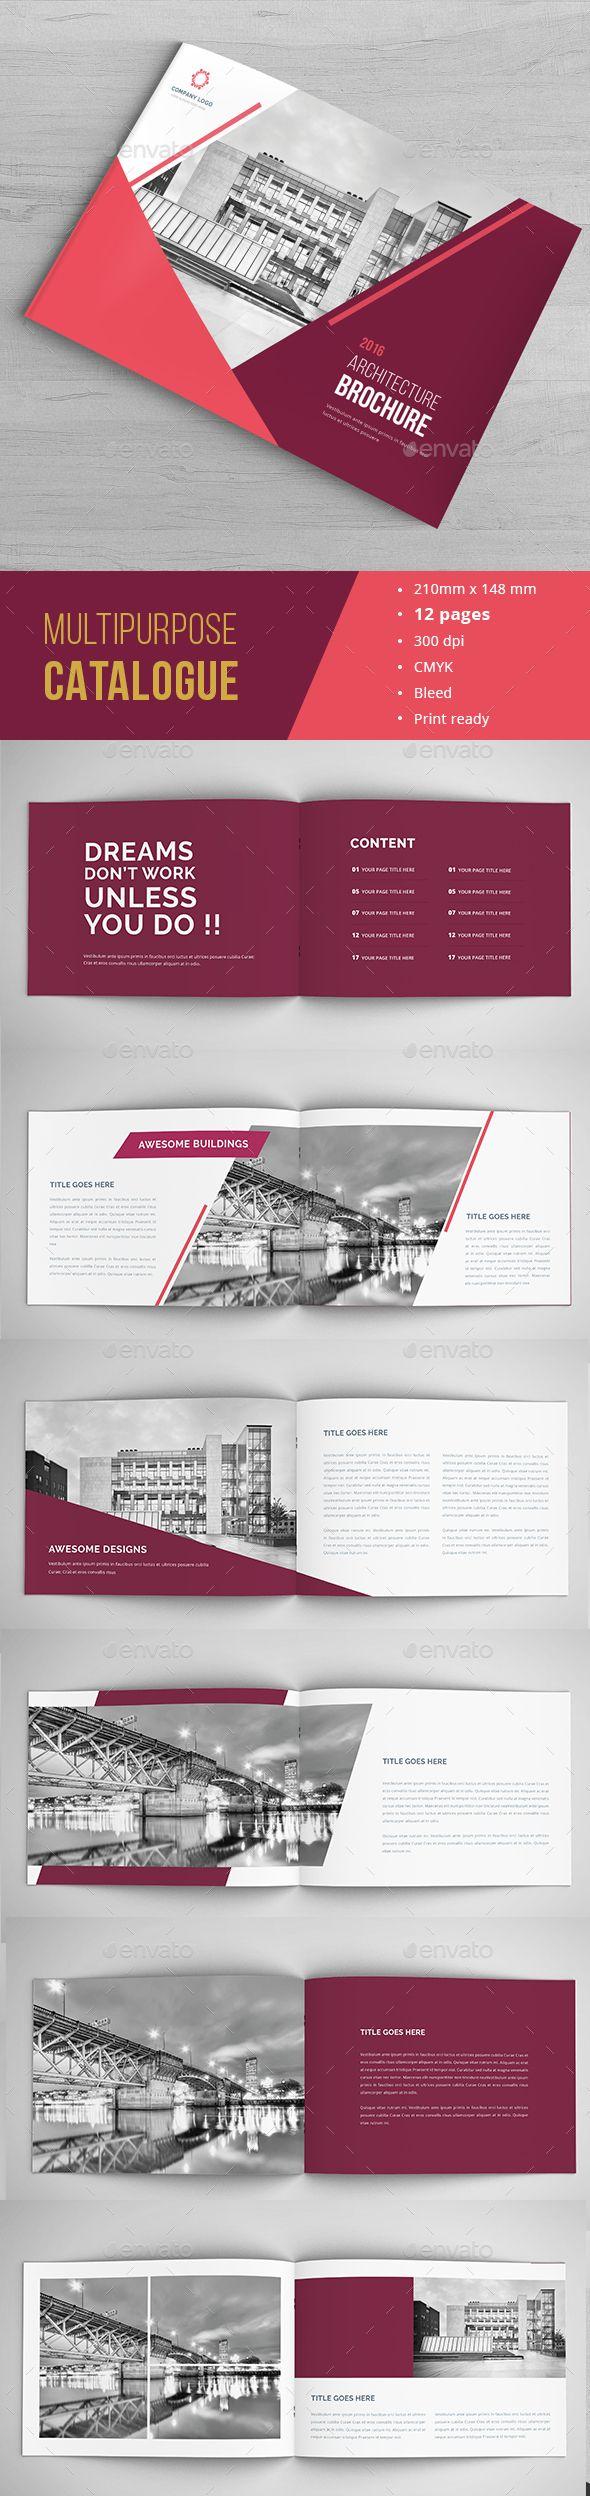 Arc Portfolio Brochure Template InDesign INDD. Download here: http ...